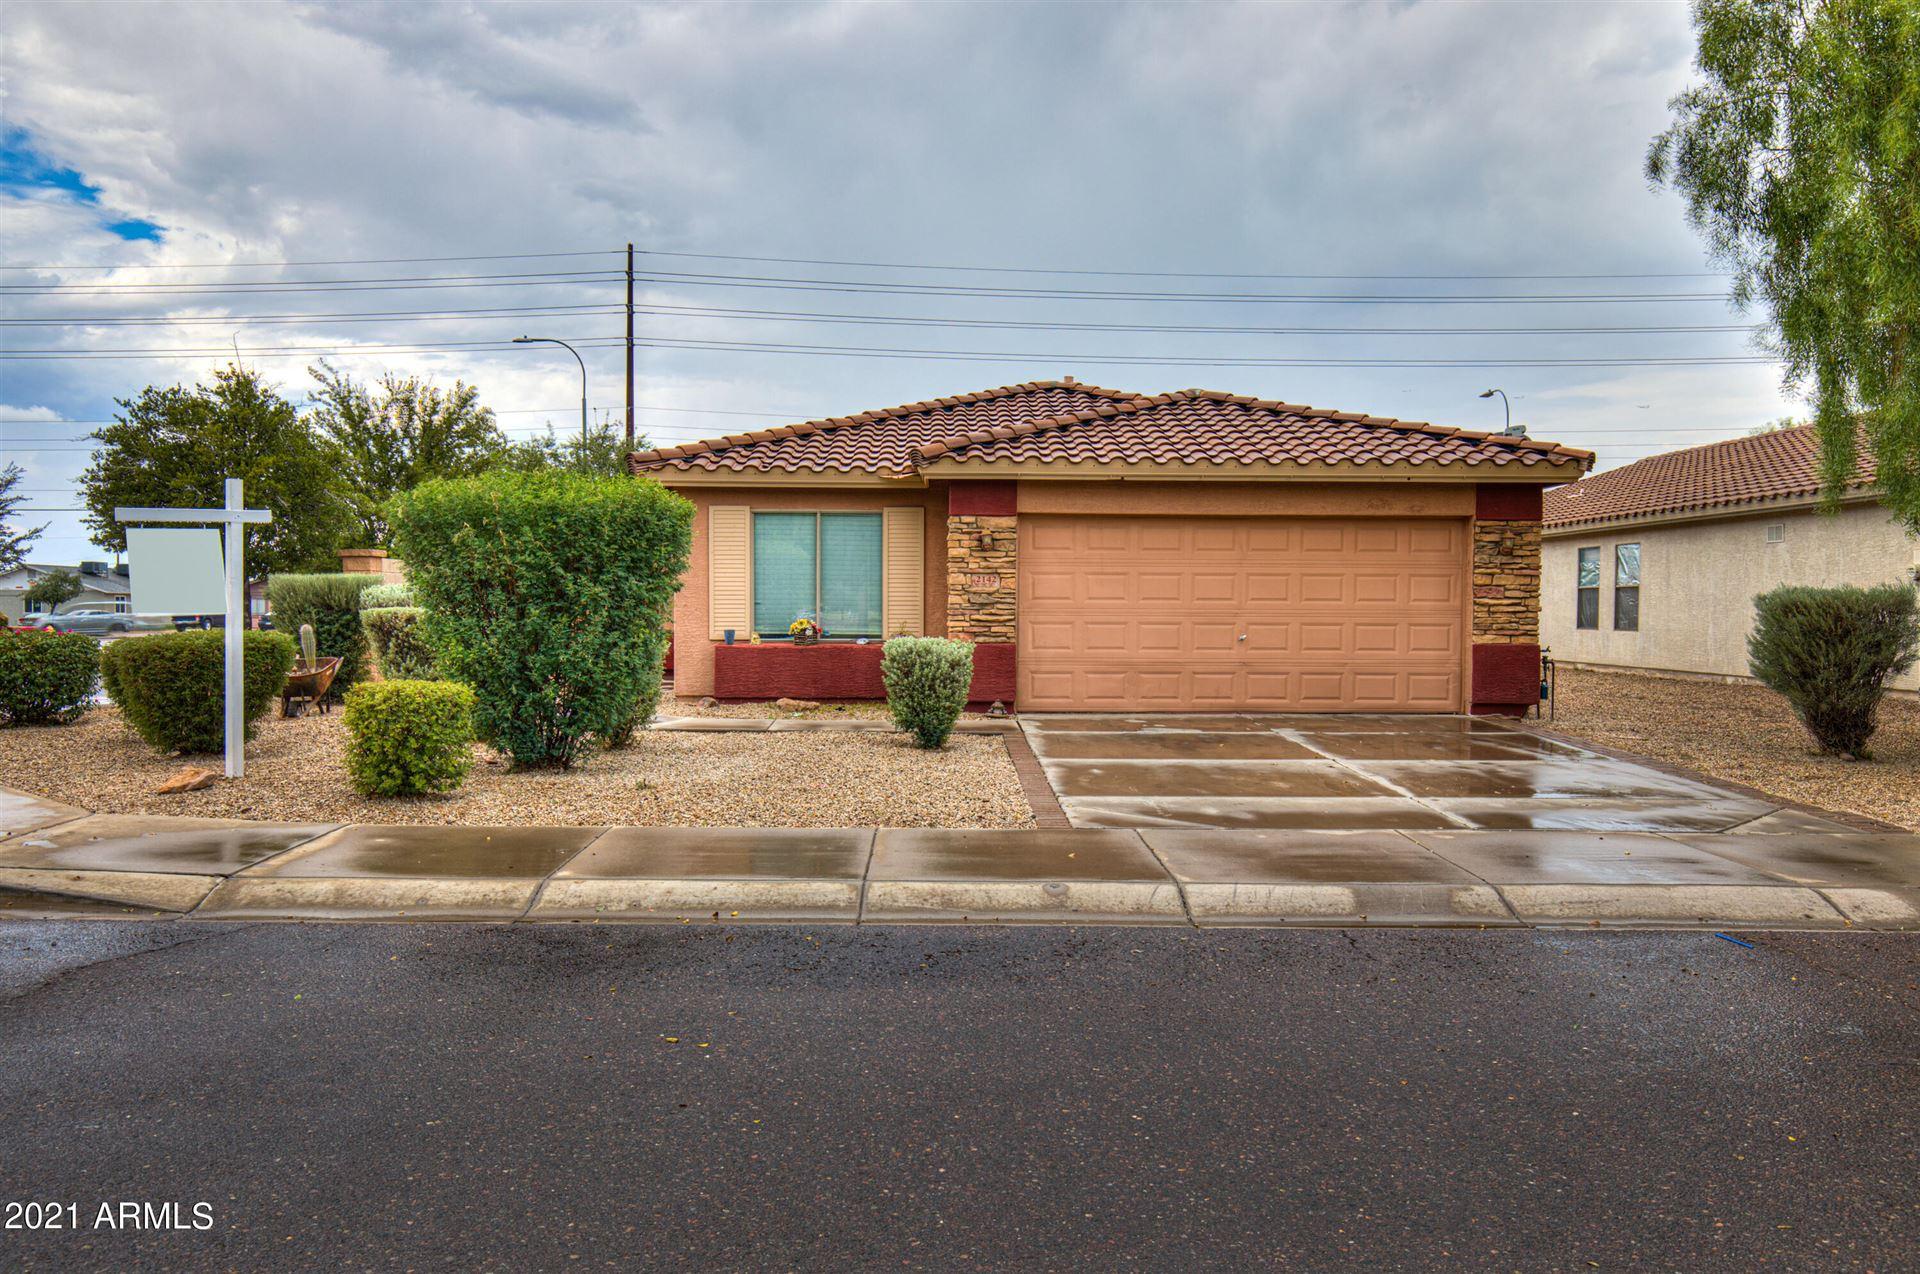 Photo of 2142 W PLEASANT Lane, Phoenix, AZ 85041 (MLS # 6295959)